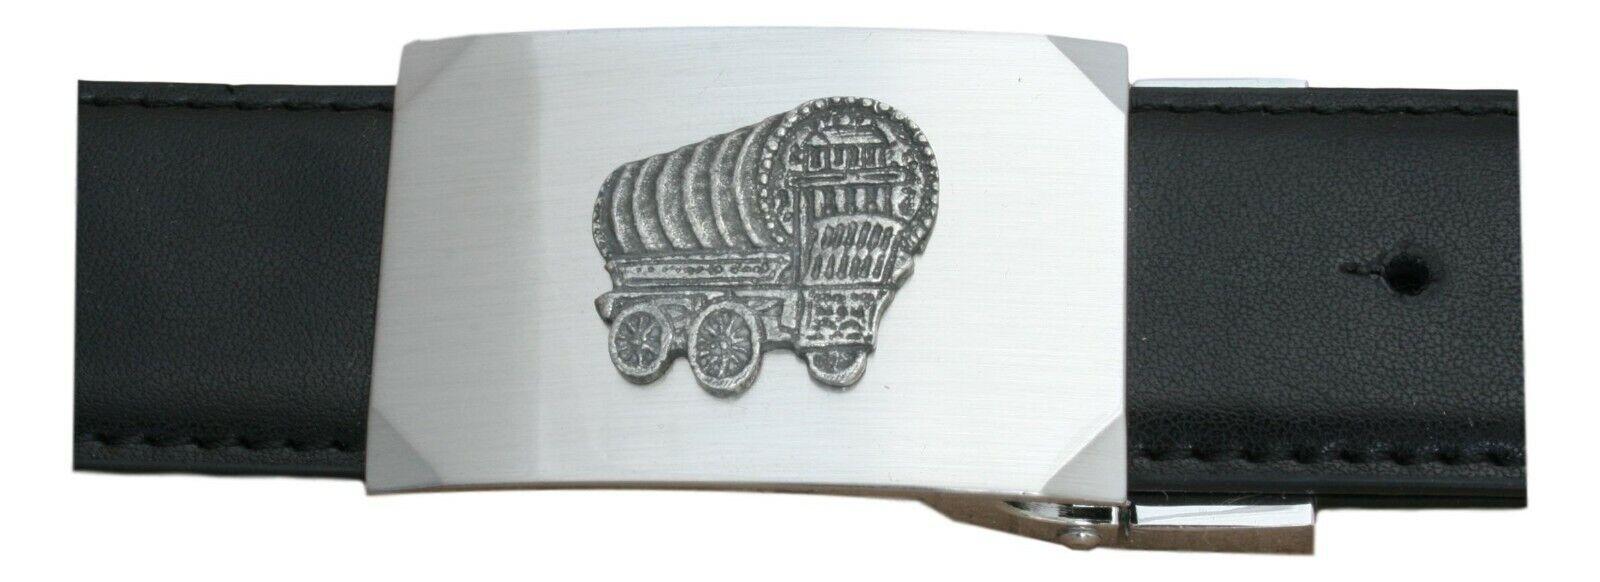 Romany Caravan Design Belt and Buckle Set Black Leather Romany Gift 448